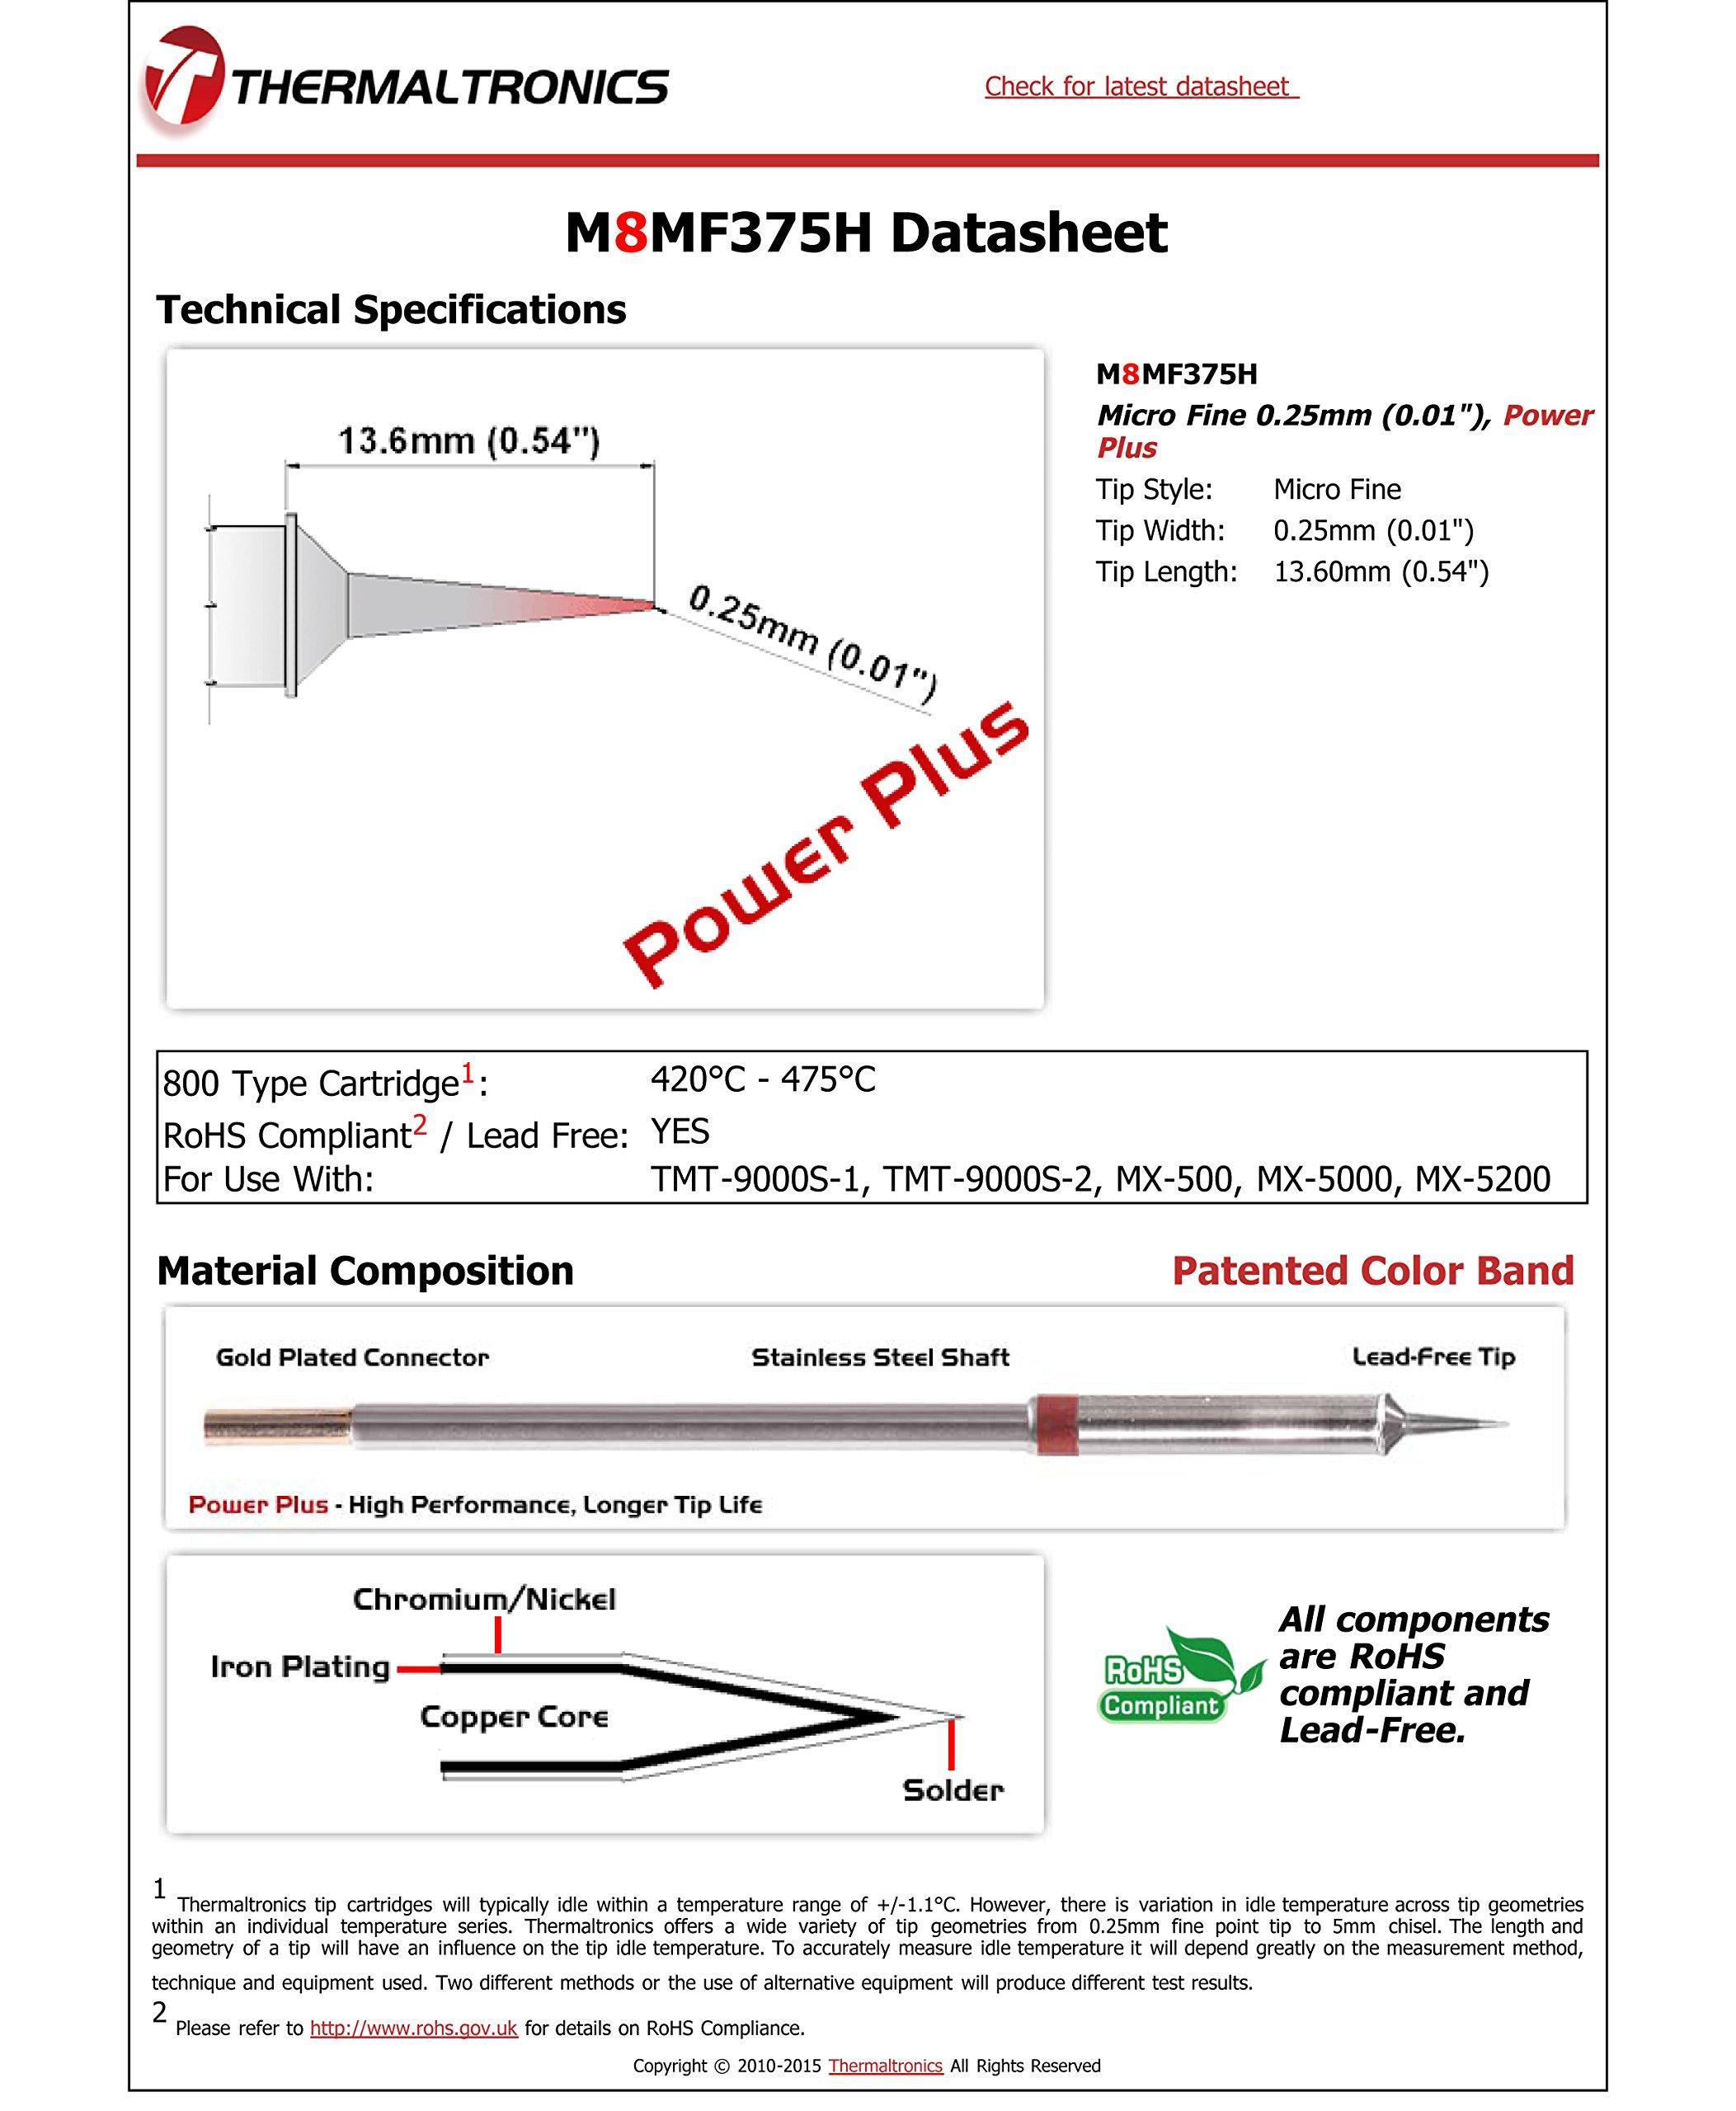 Thermaltronics M8MF375H Micro Fine 0.25mm (0.01''), Power Plus